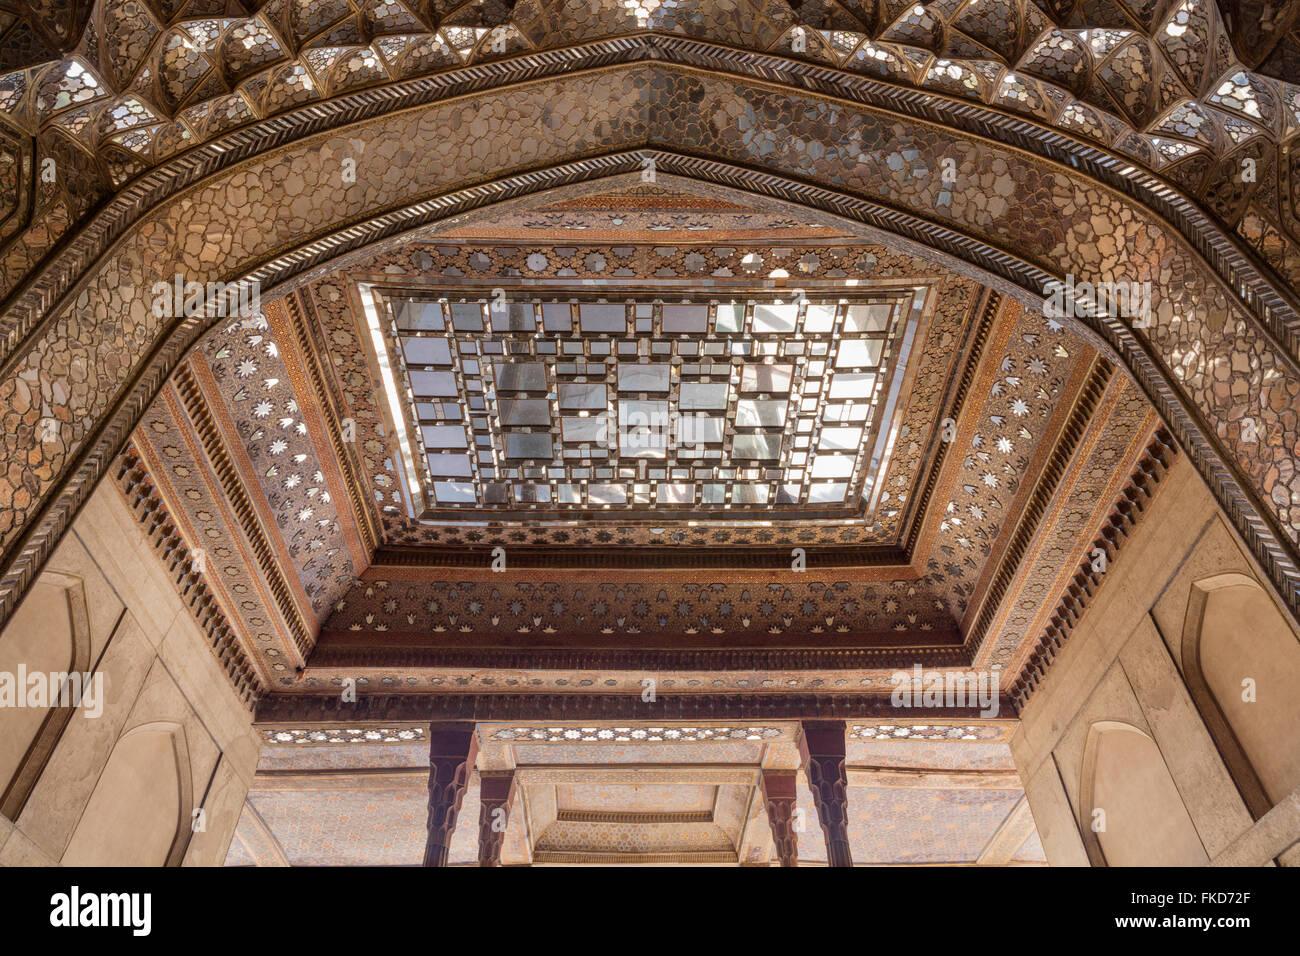 Detail of roof of talar and Safavid mirror work at the 17th Century Chehel Sotun pavilion, Isfahan, Iran - Stock Image